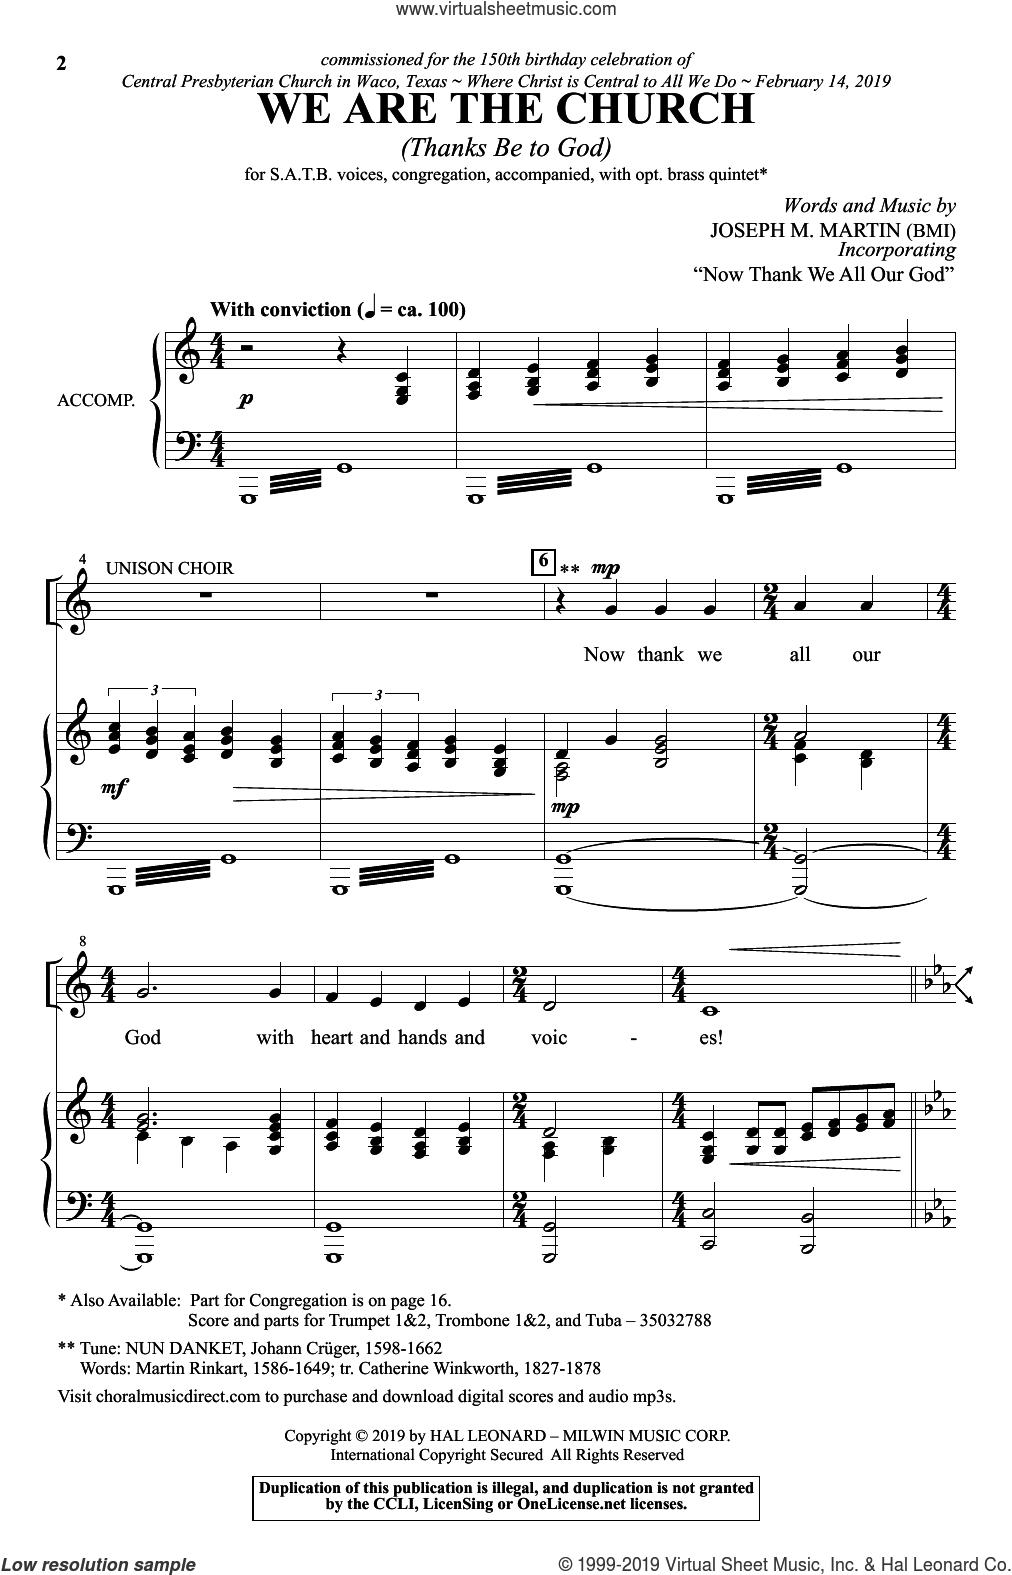 We Are The Church (Thanks Be To God) sheet music for choir (SATB: soprano, alto, tenor, bass) by Joseph M. Martin, intermediate skill level